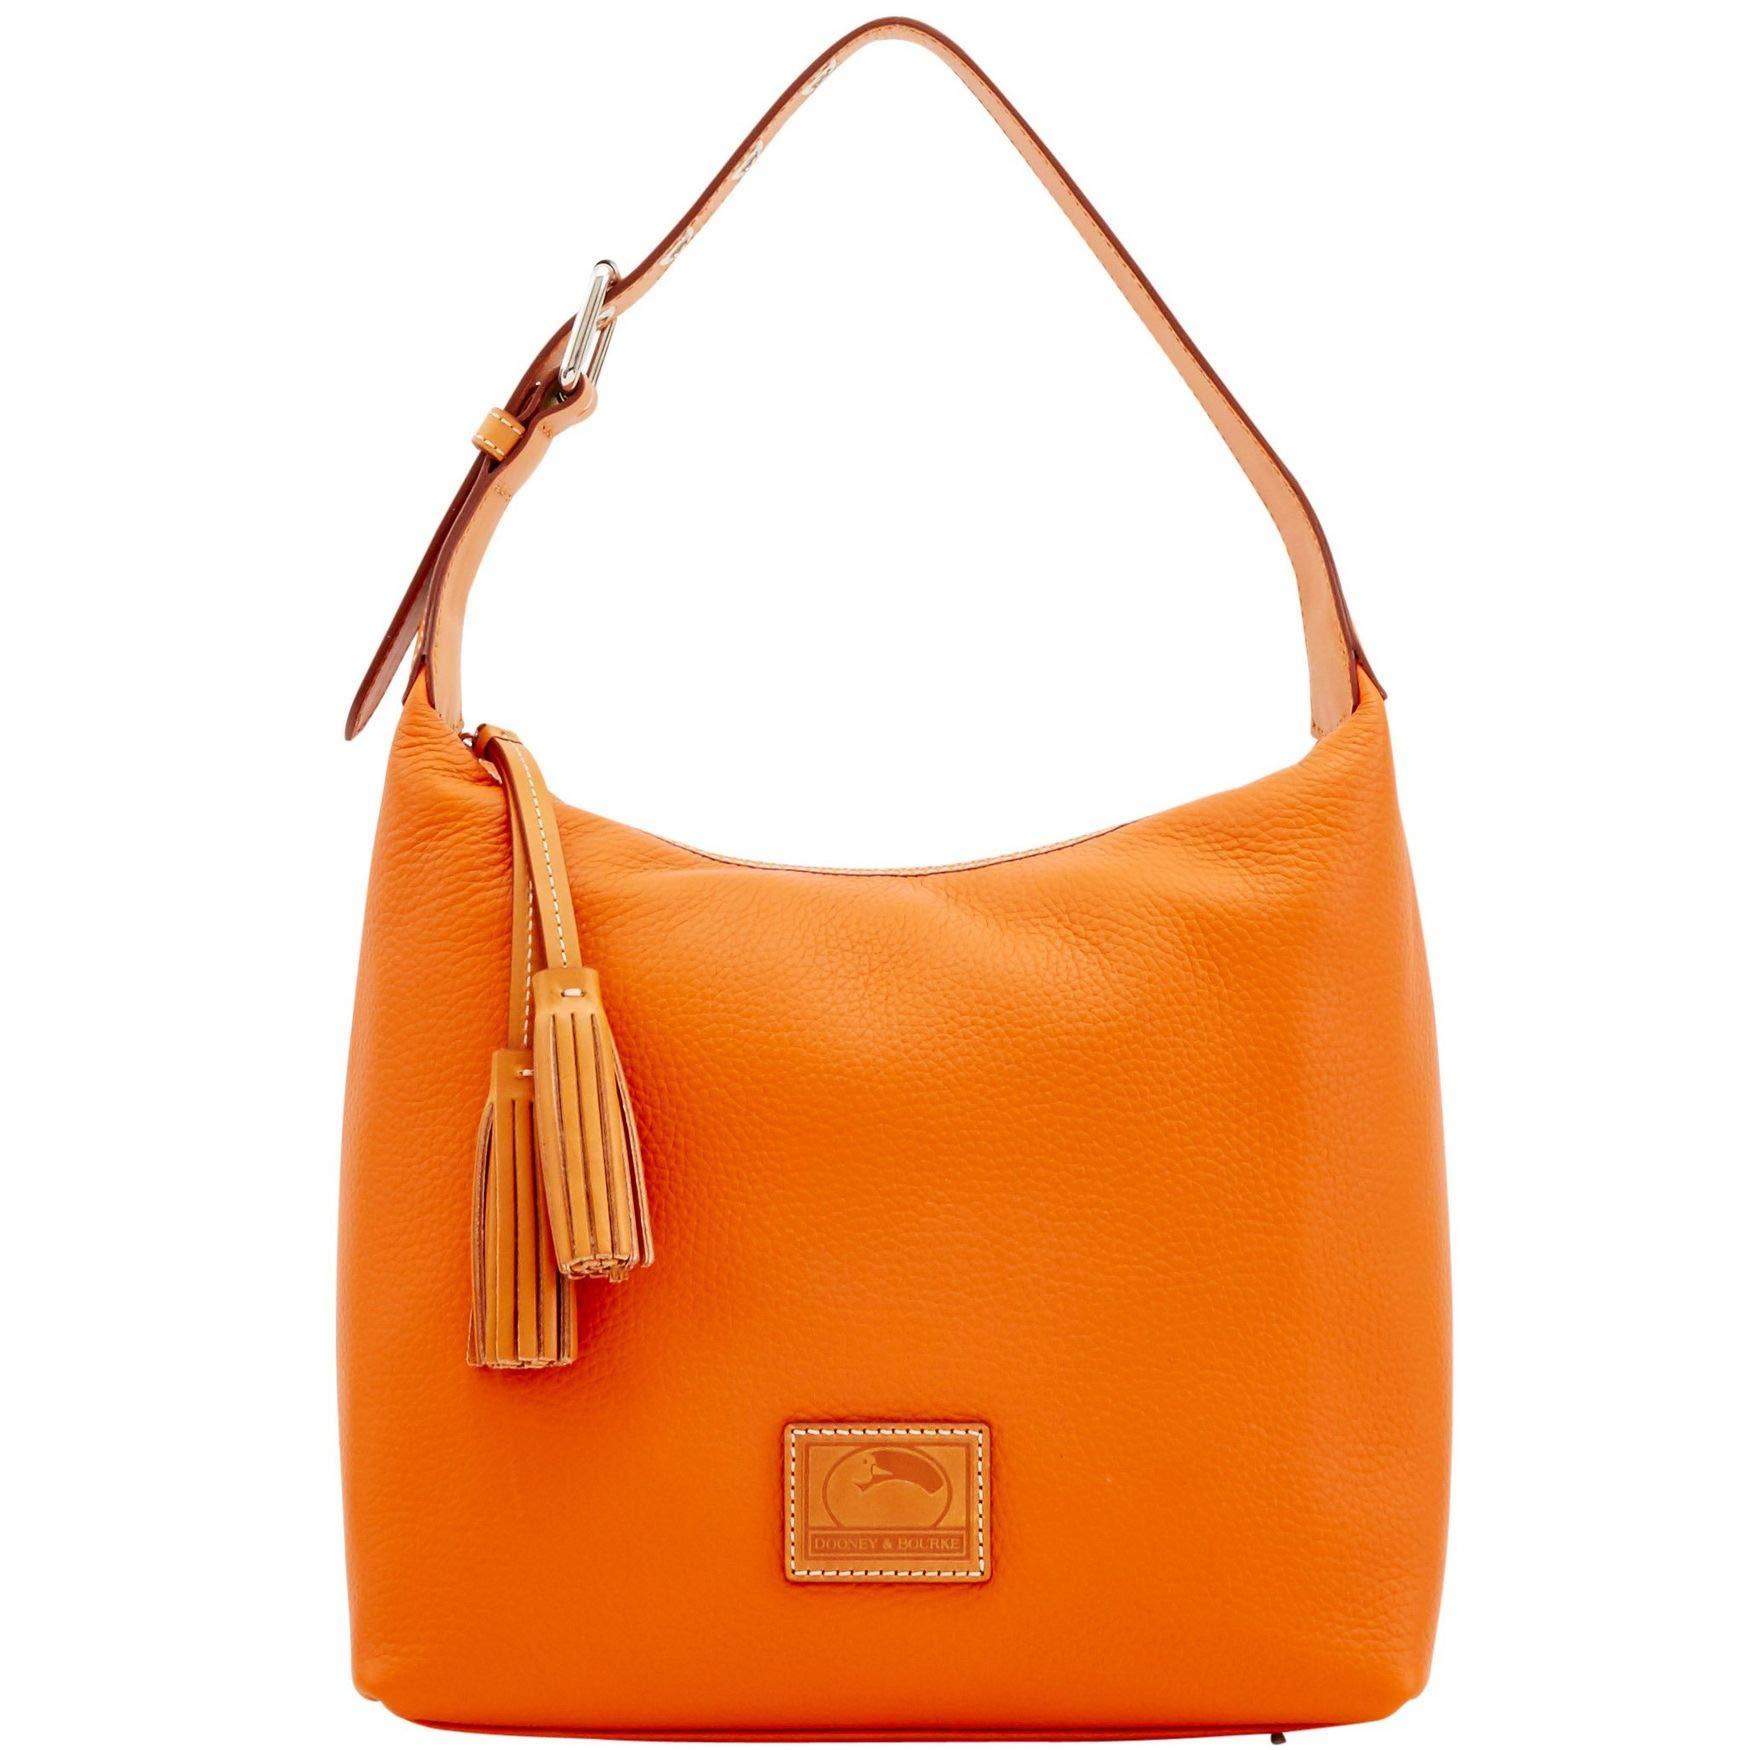 Dooney & Bourke Patterson Leather Paige Sac Shoulder Bag